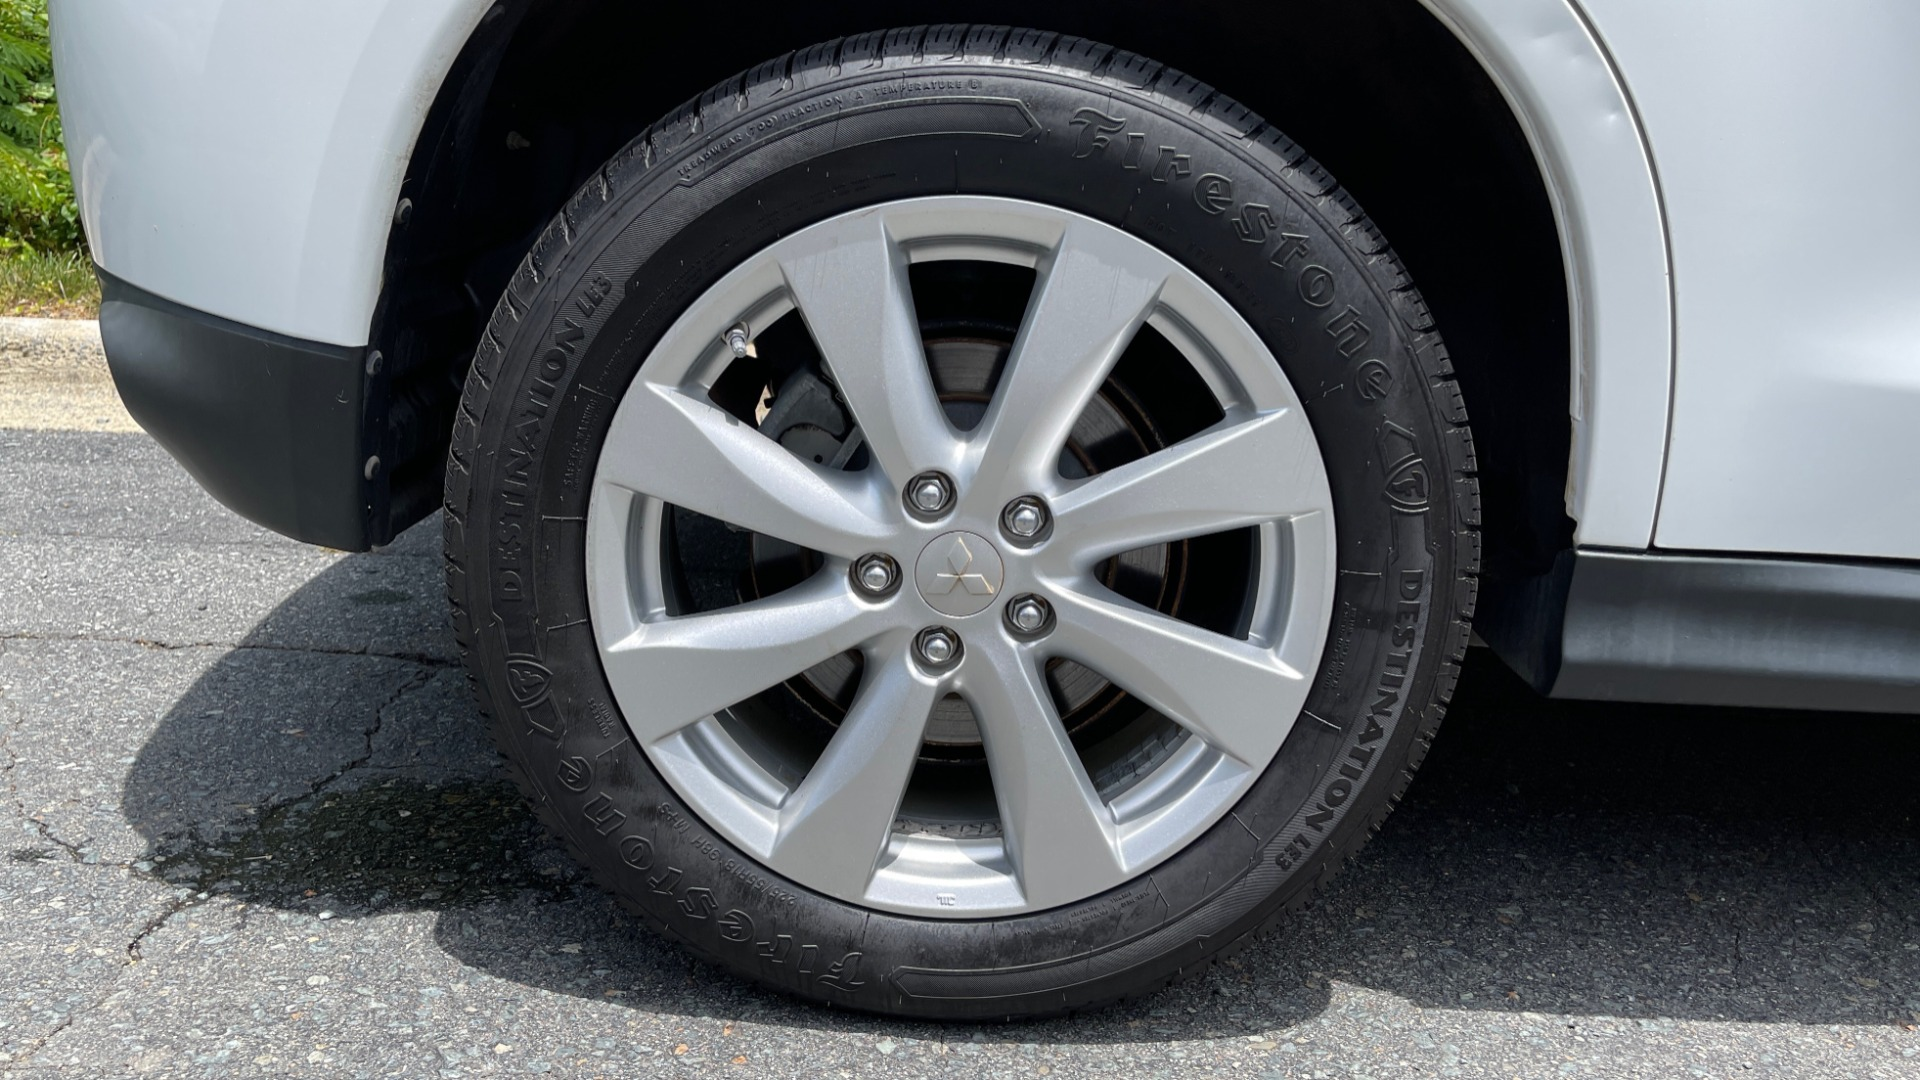 Used 2014 Mitsubishi OUTLANDER SPORT ES 2WD / 2.0L / CVT TRANS / 18IN WHEELS / 31MPG for sale $8,495 at Formula Imports in Charlotte NC 28227 57